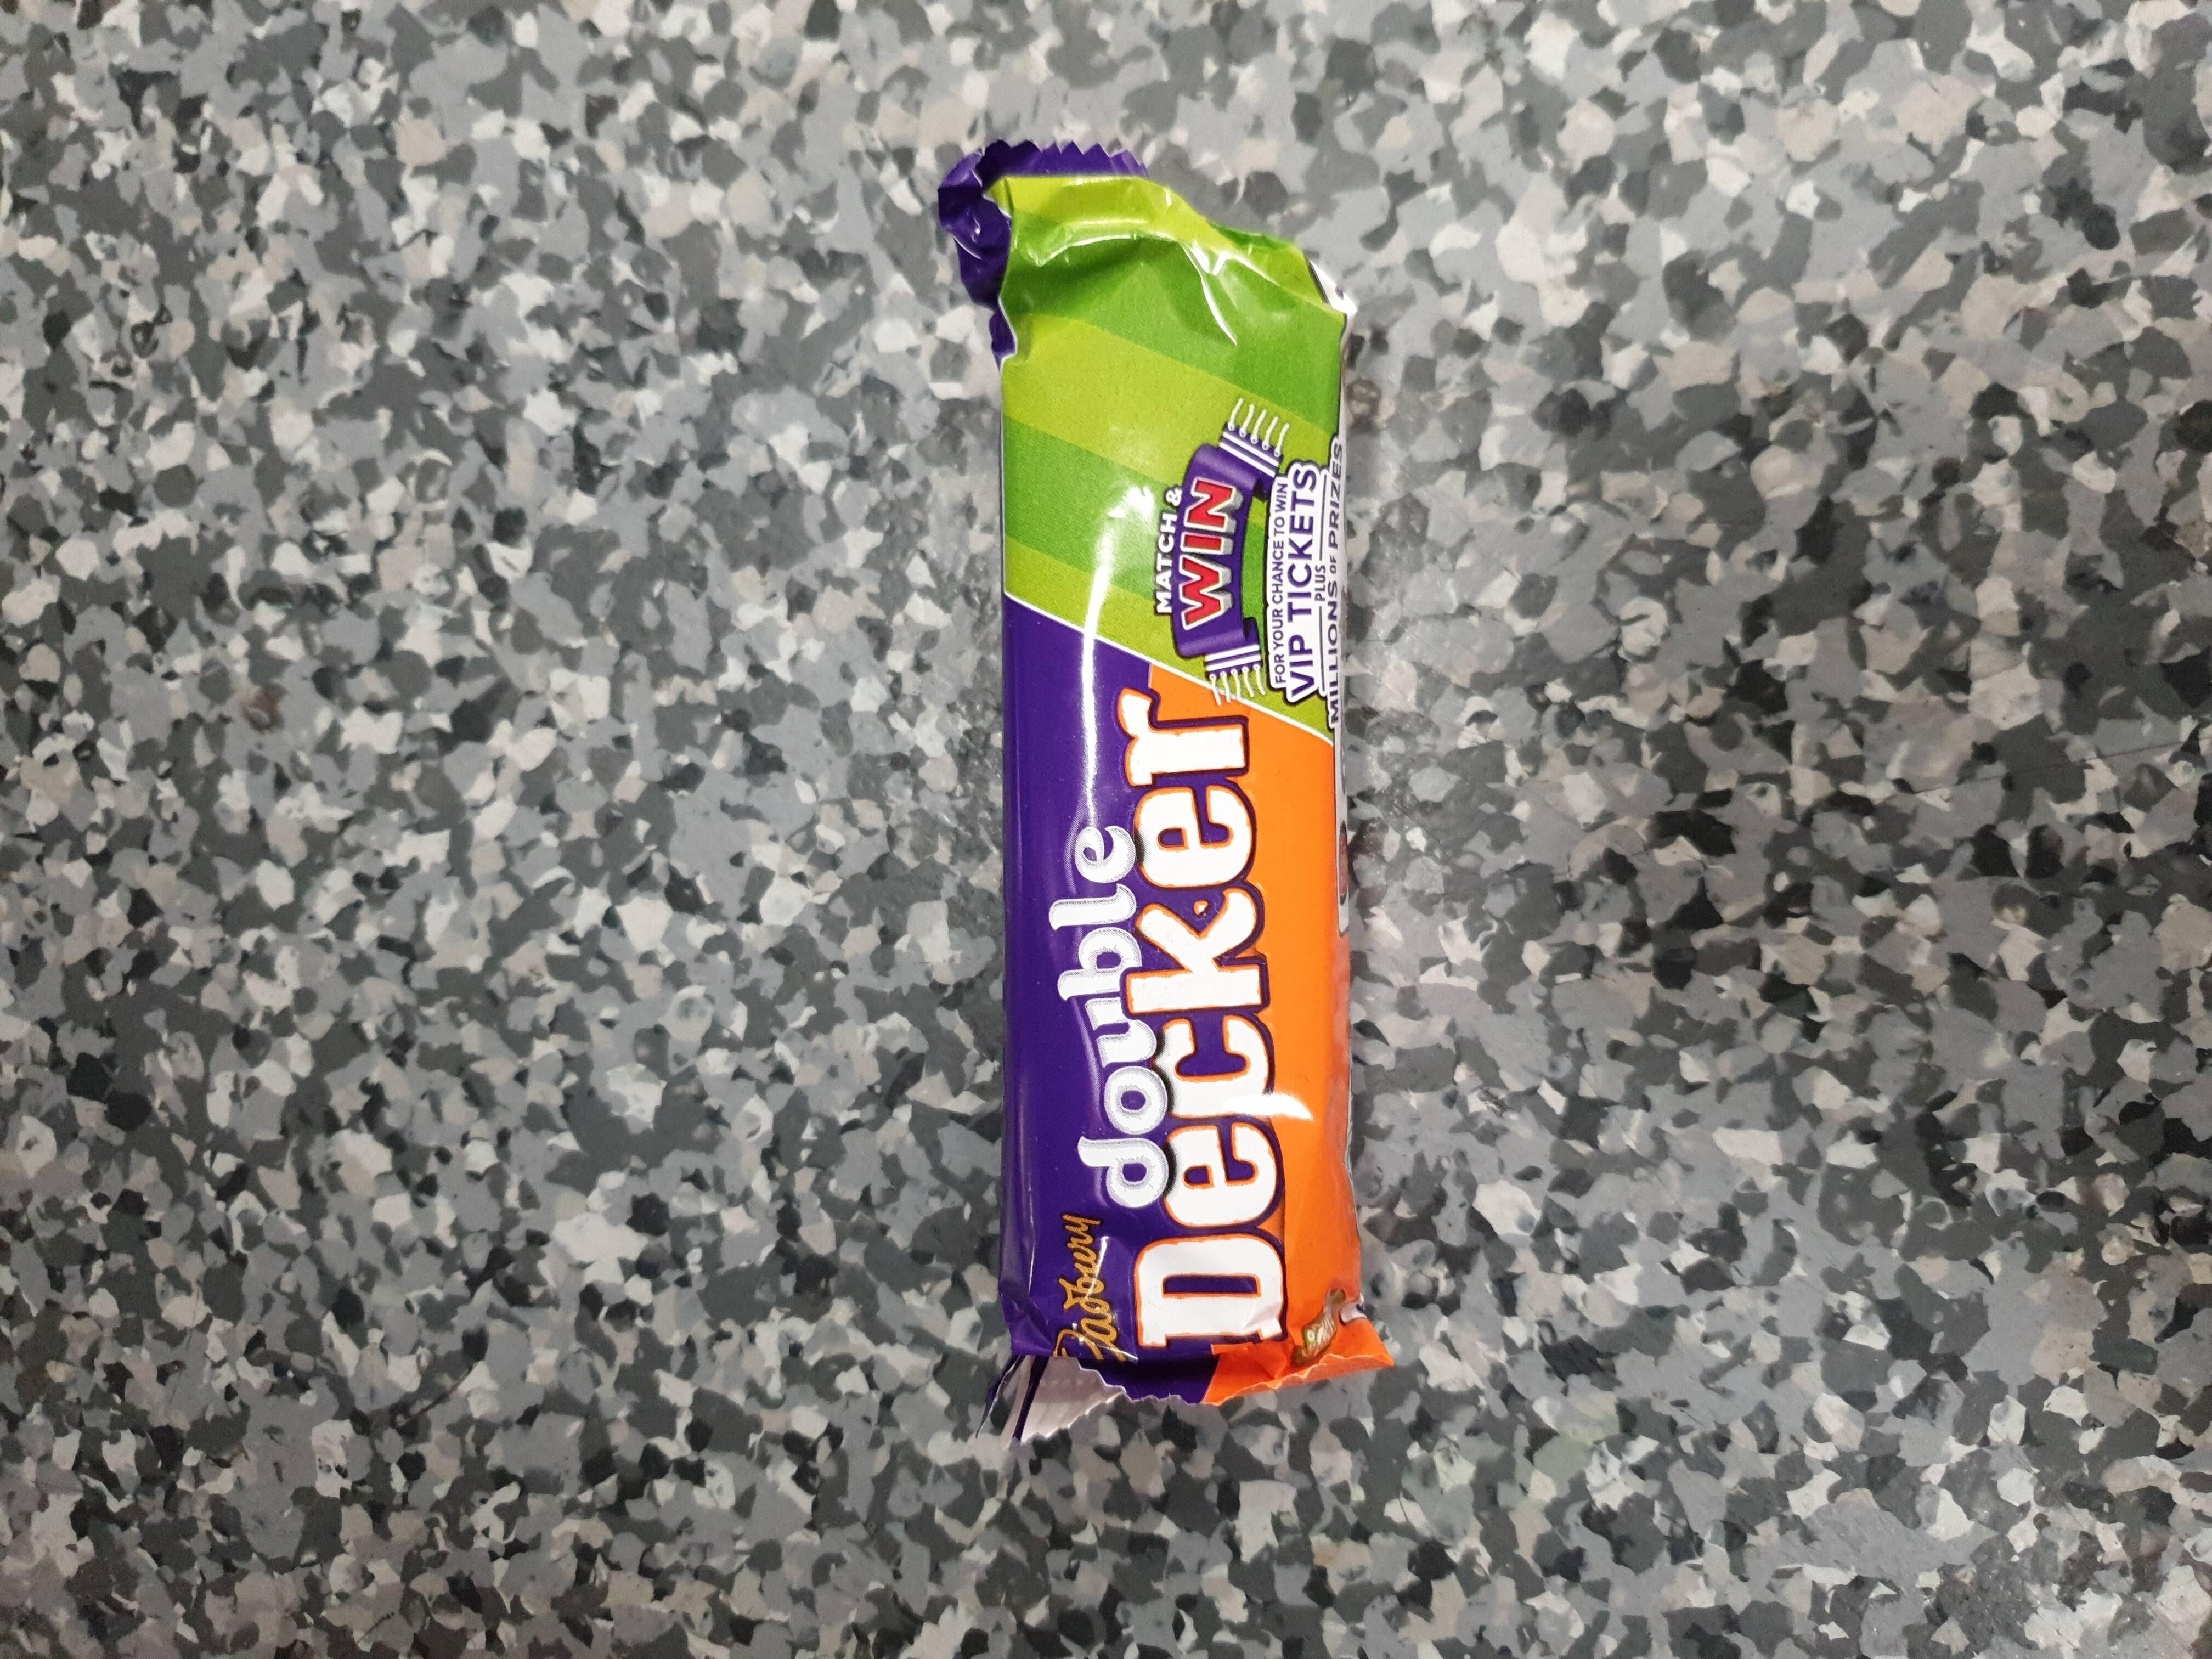 Cadbury double decker chocolate bar - Product - en